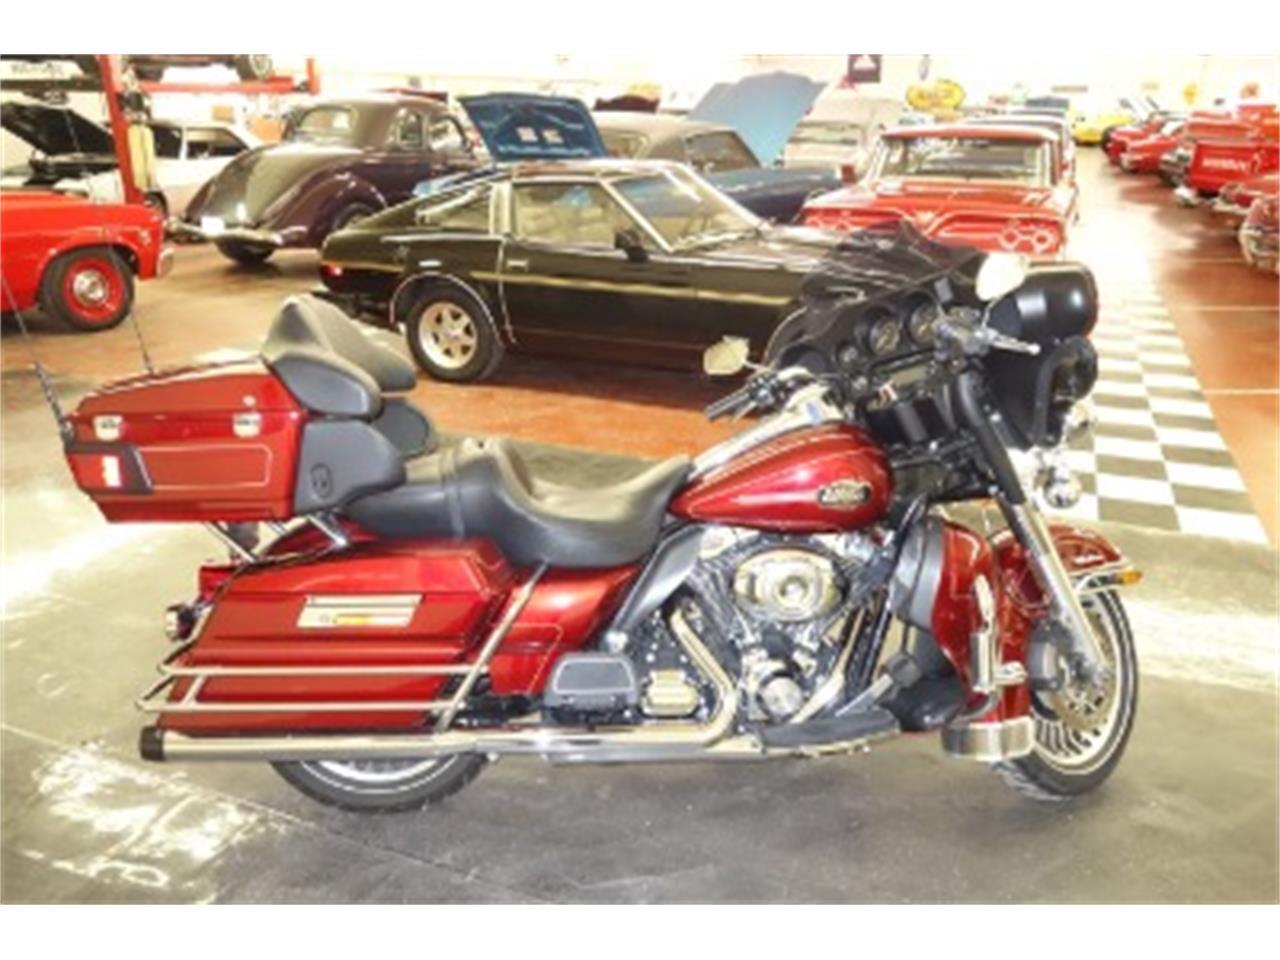 2009 Harley-Davidson Motorcycle (CC-1164152) for sale in Mundelein, Illinois